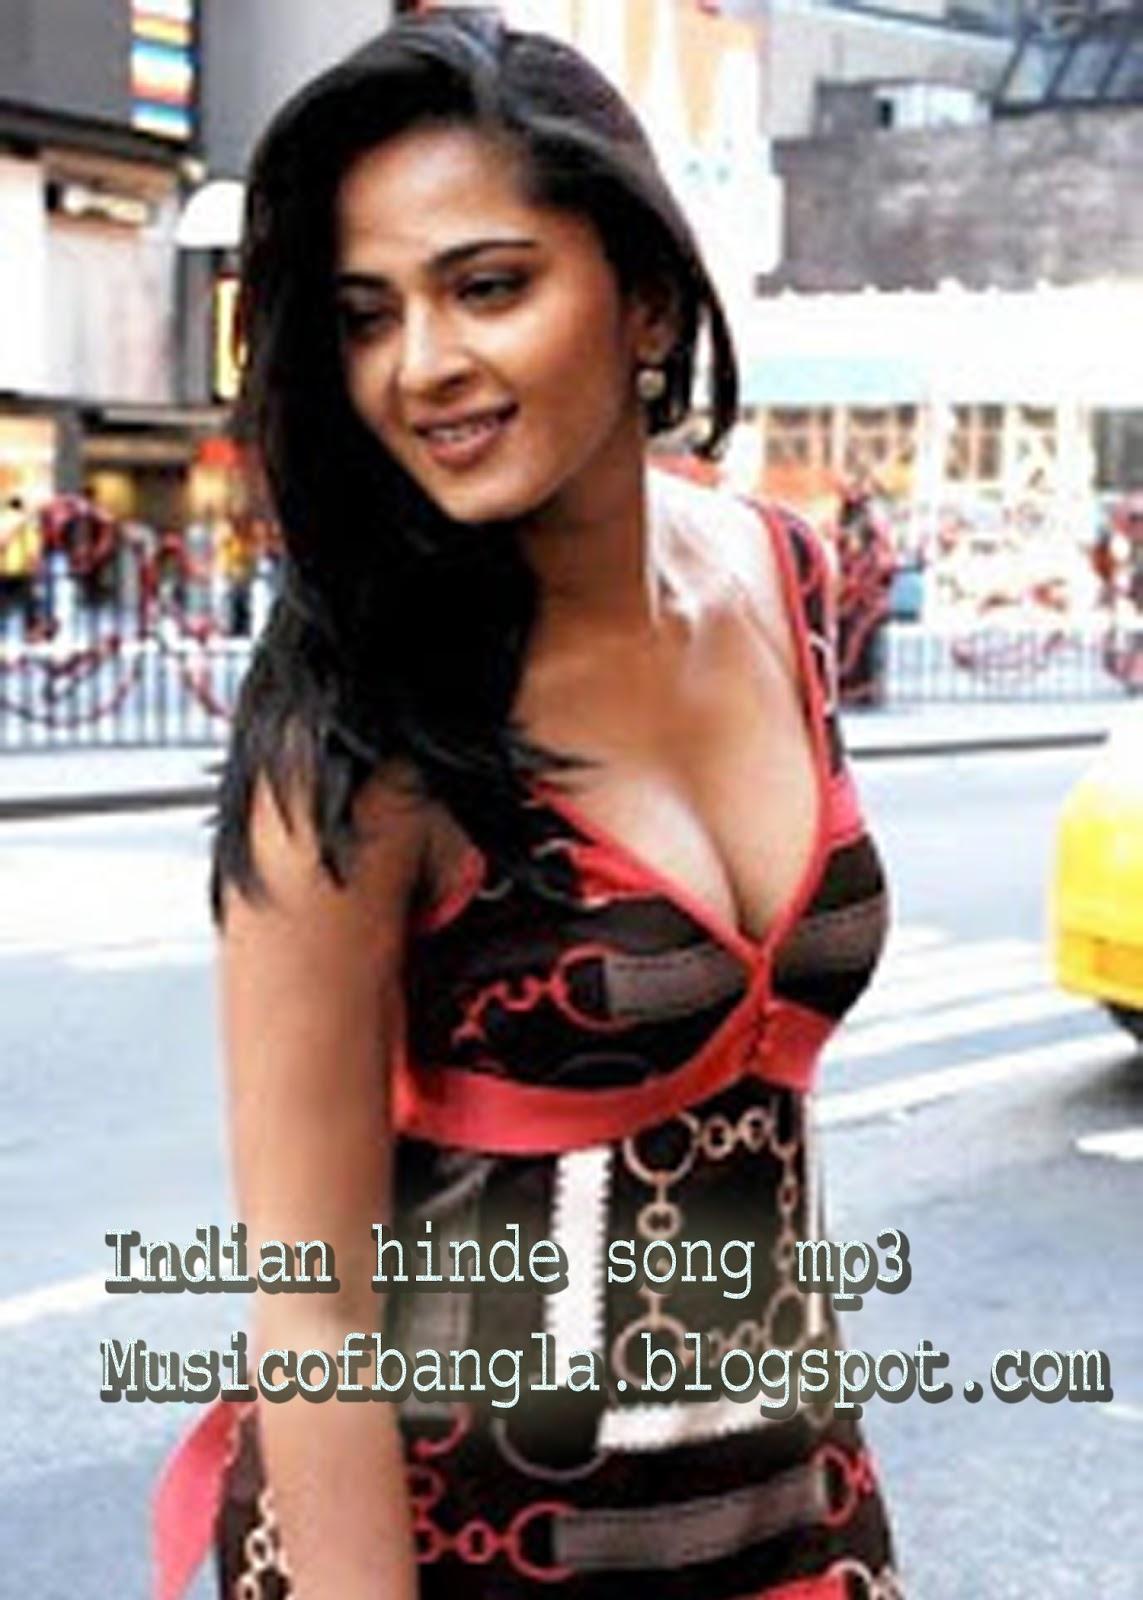 Aag Ka Gola Sunny Deol Full Movie Download